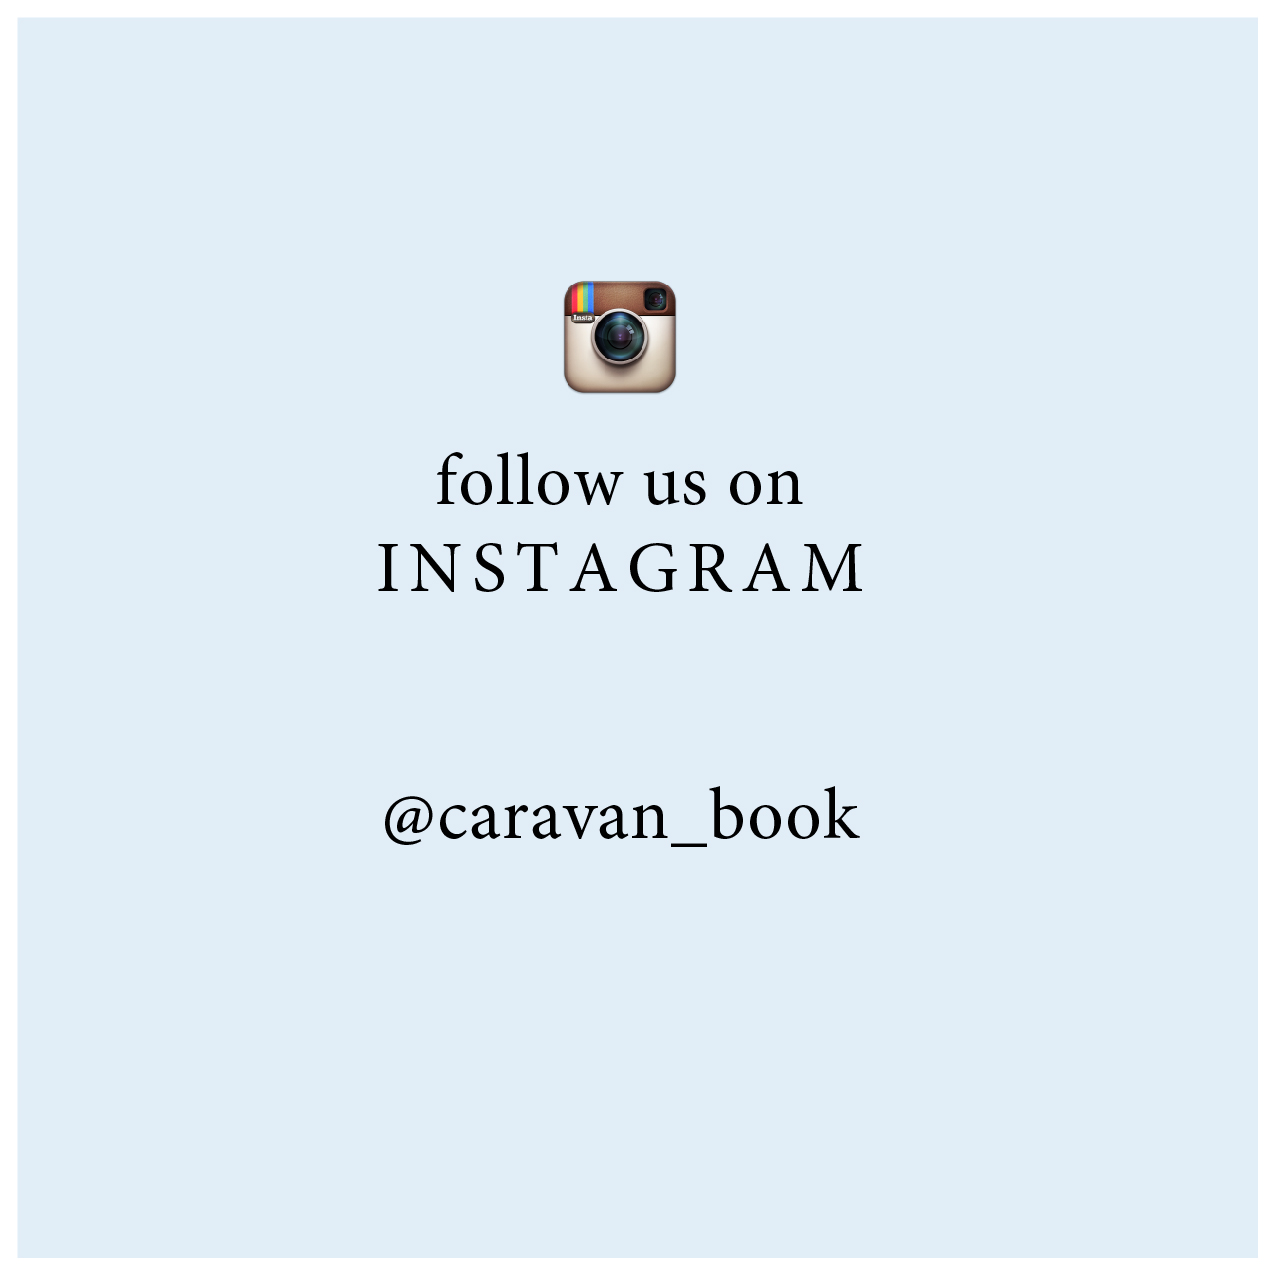 caravanbook_followusInstagram-01.jpg